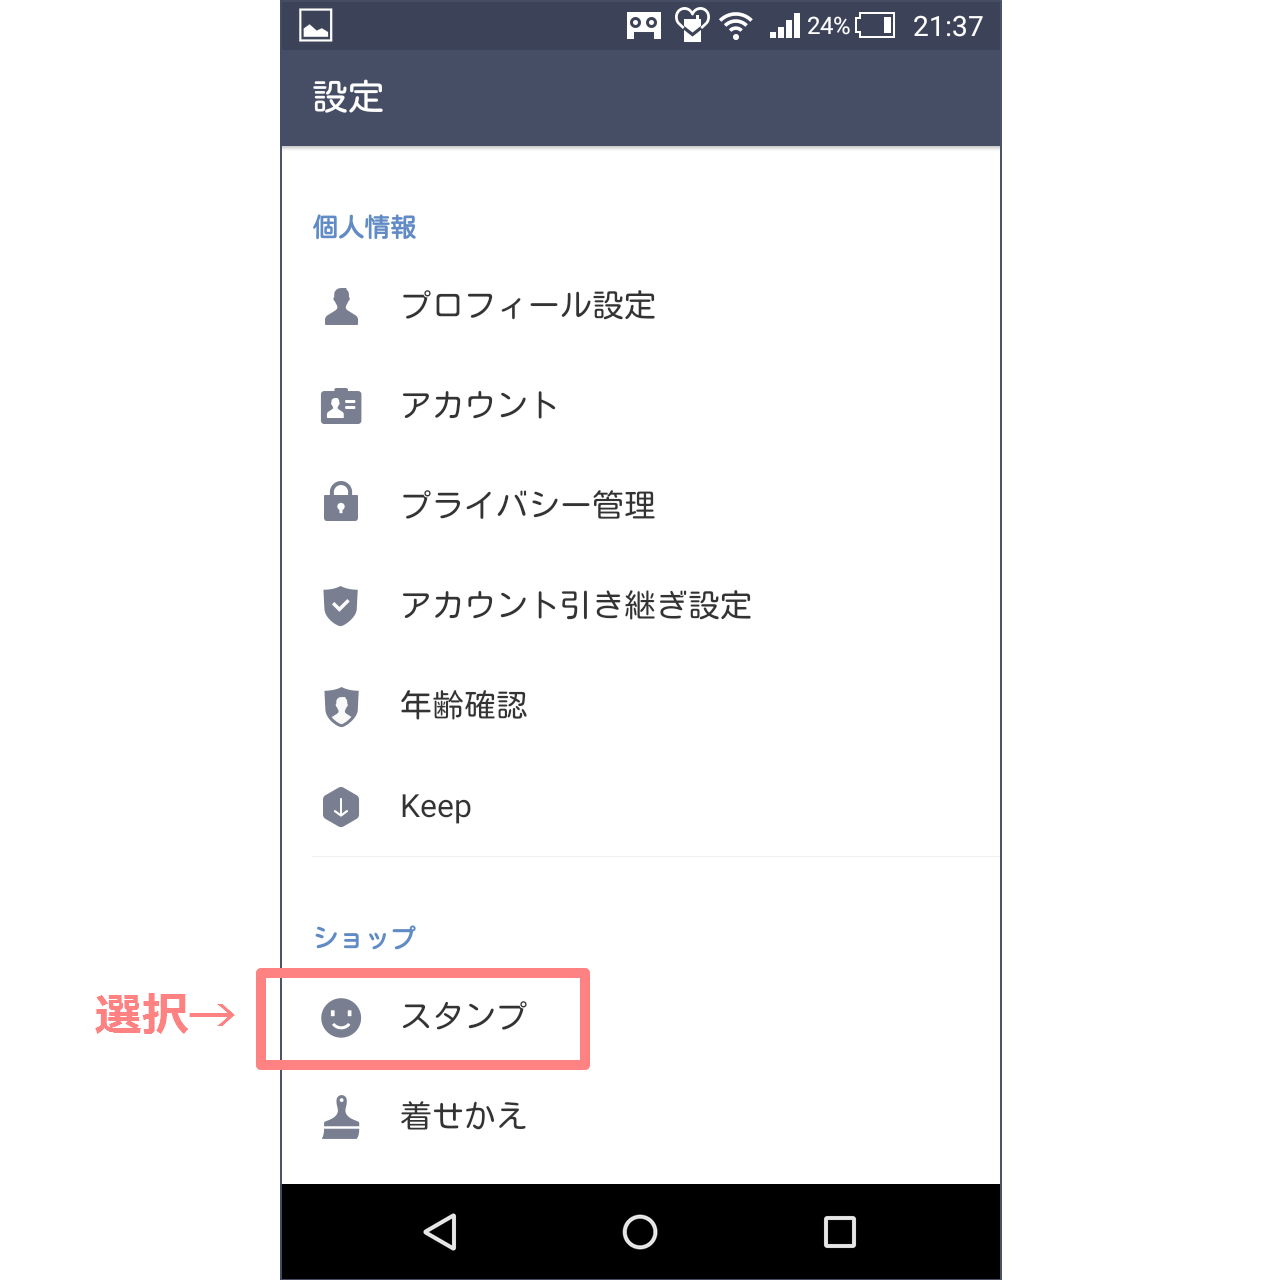 Screenshot_2016-05-10-21-37-46